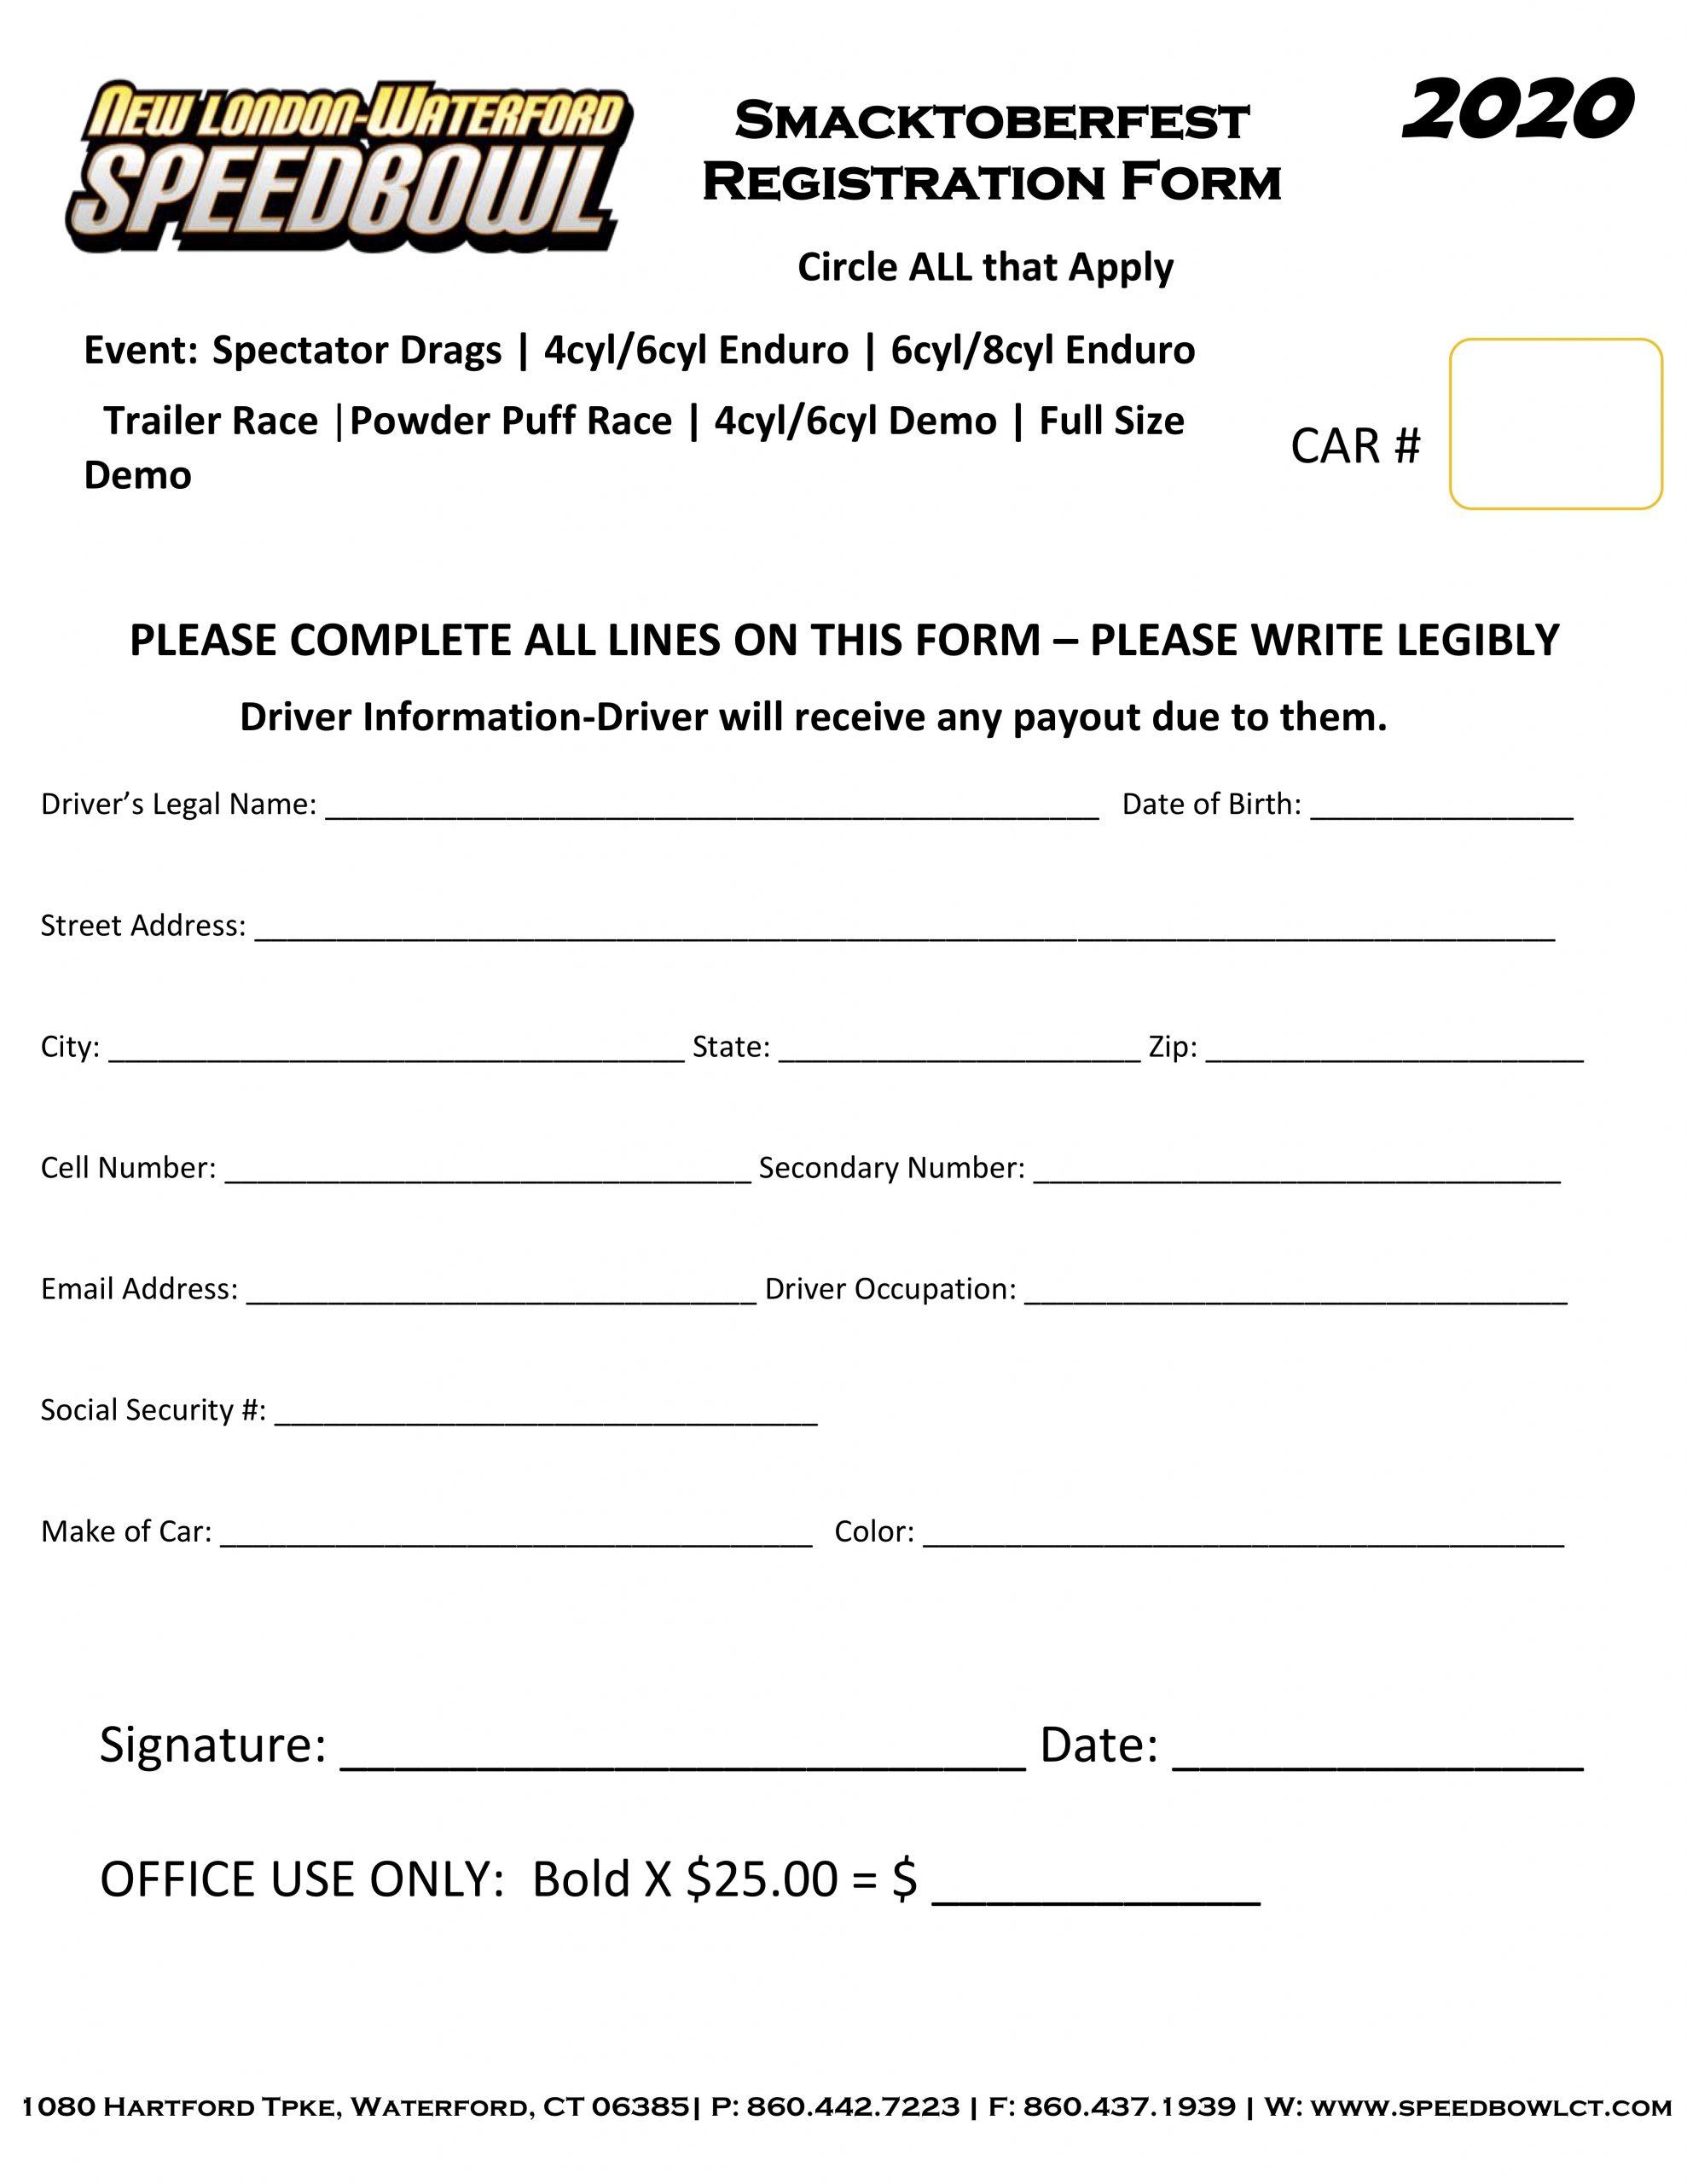 2020 Smacktoberfest Registration Form